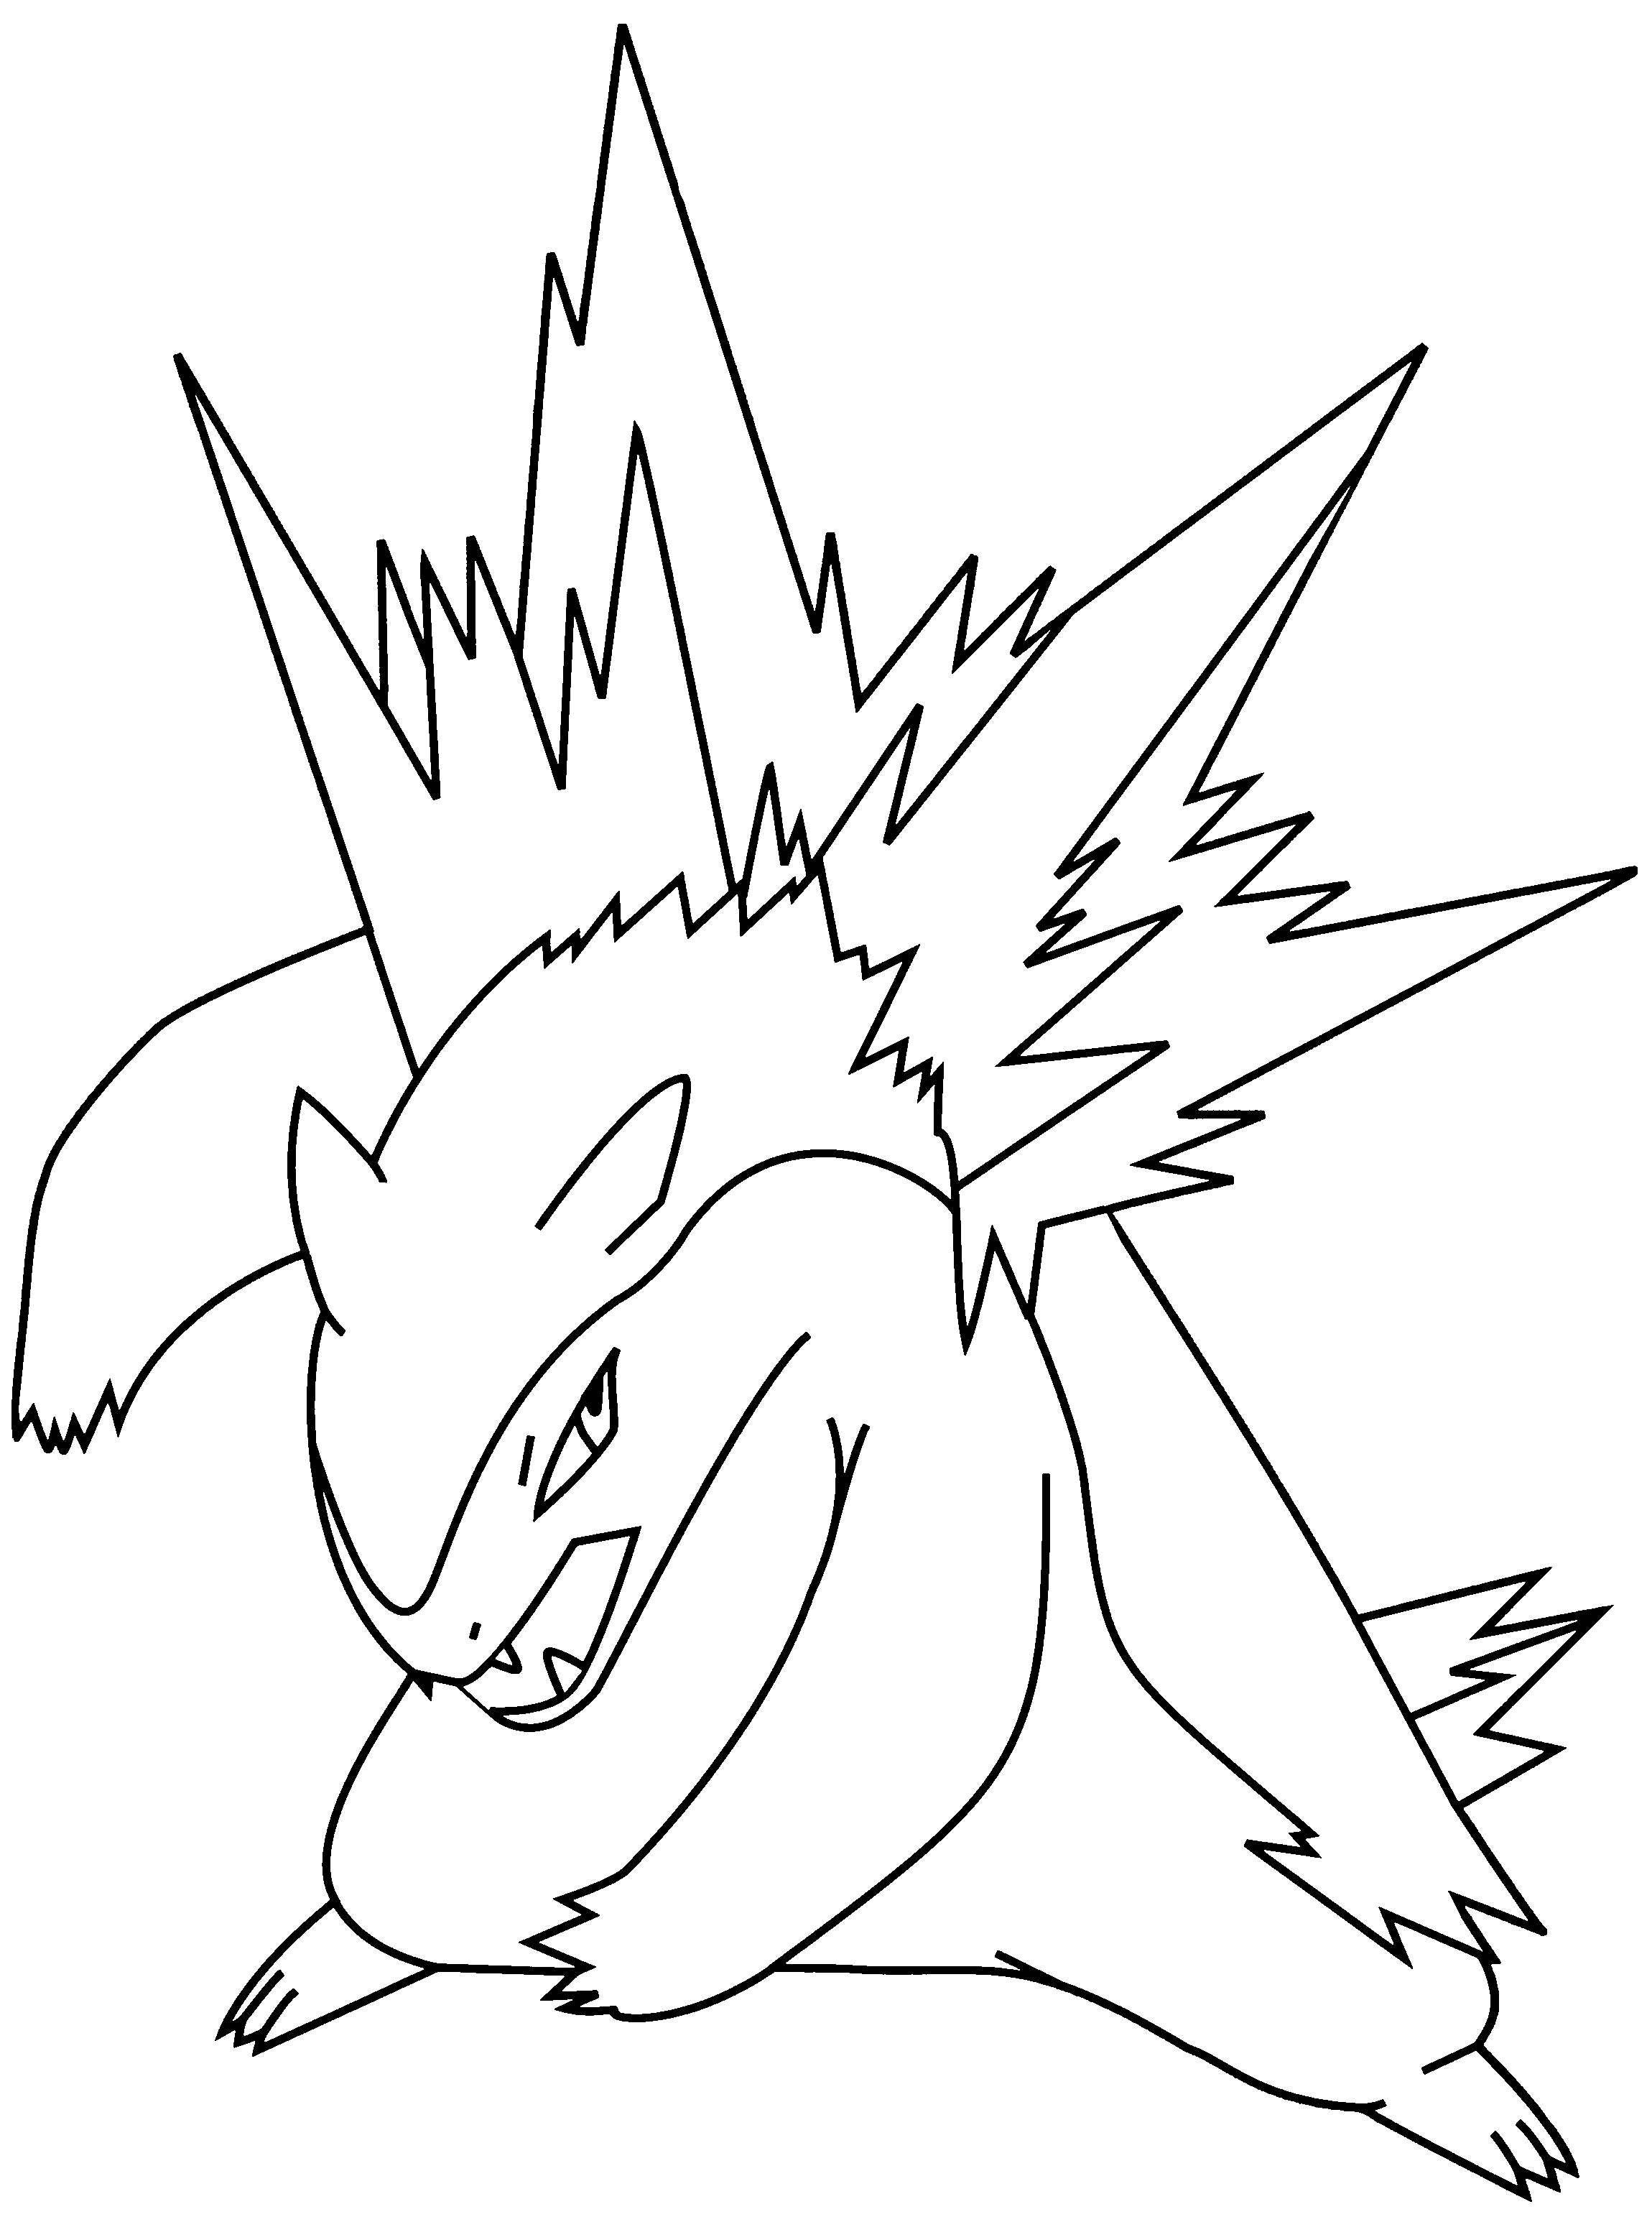 59 Reizend Ausmalbilder Pokemon Go Pokemon Malvorlagen Pokemon Skizze Malvorlagen